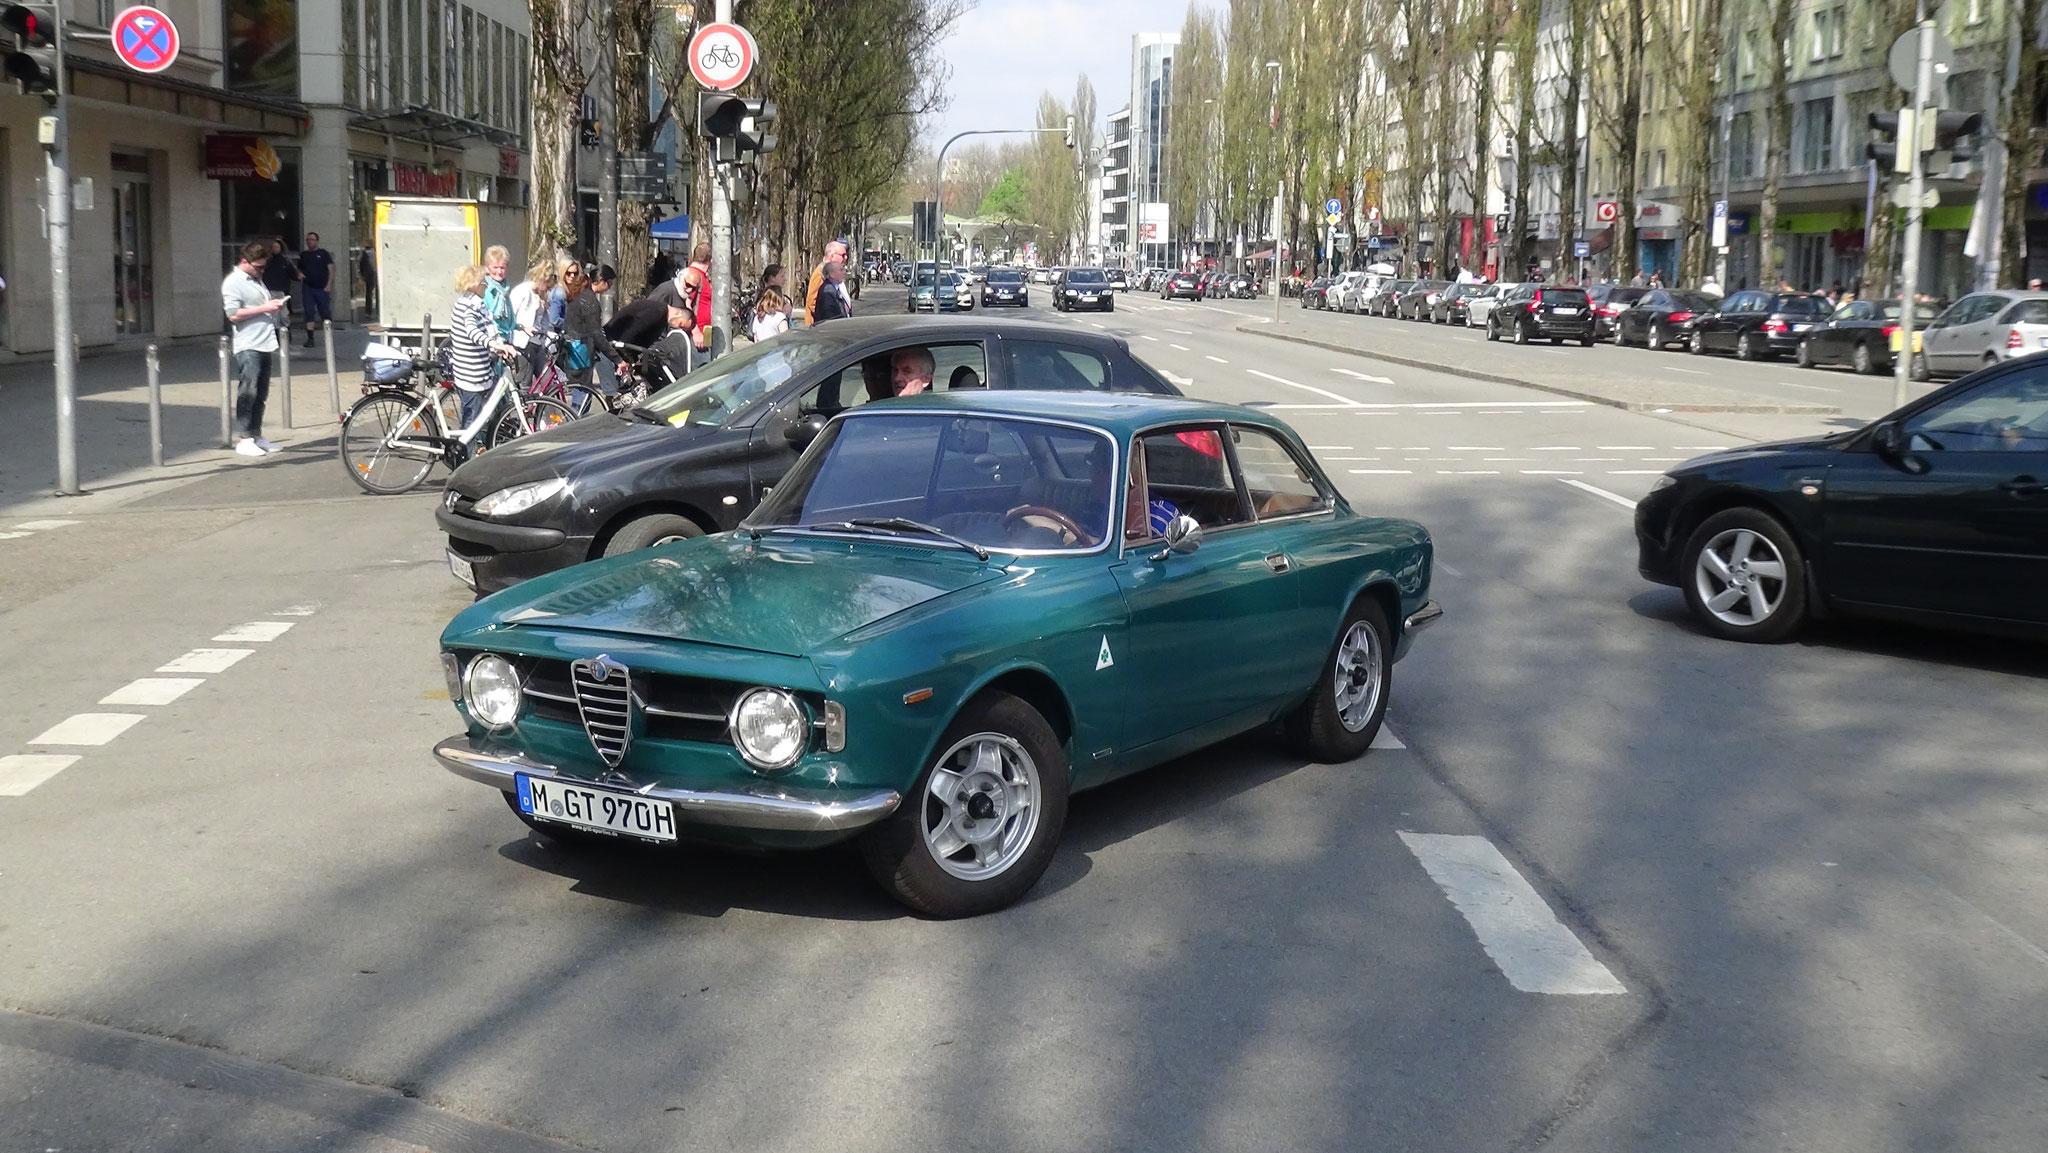 Alfa Romeo Giulia Sprint GT - M-GT-970H